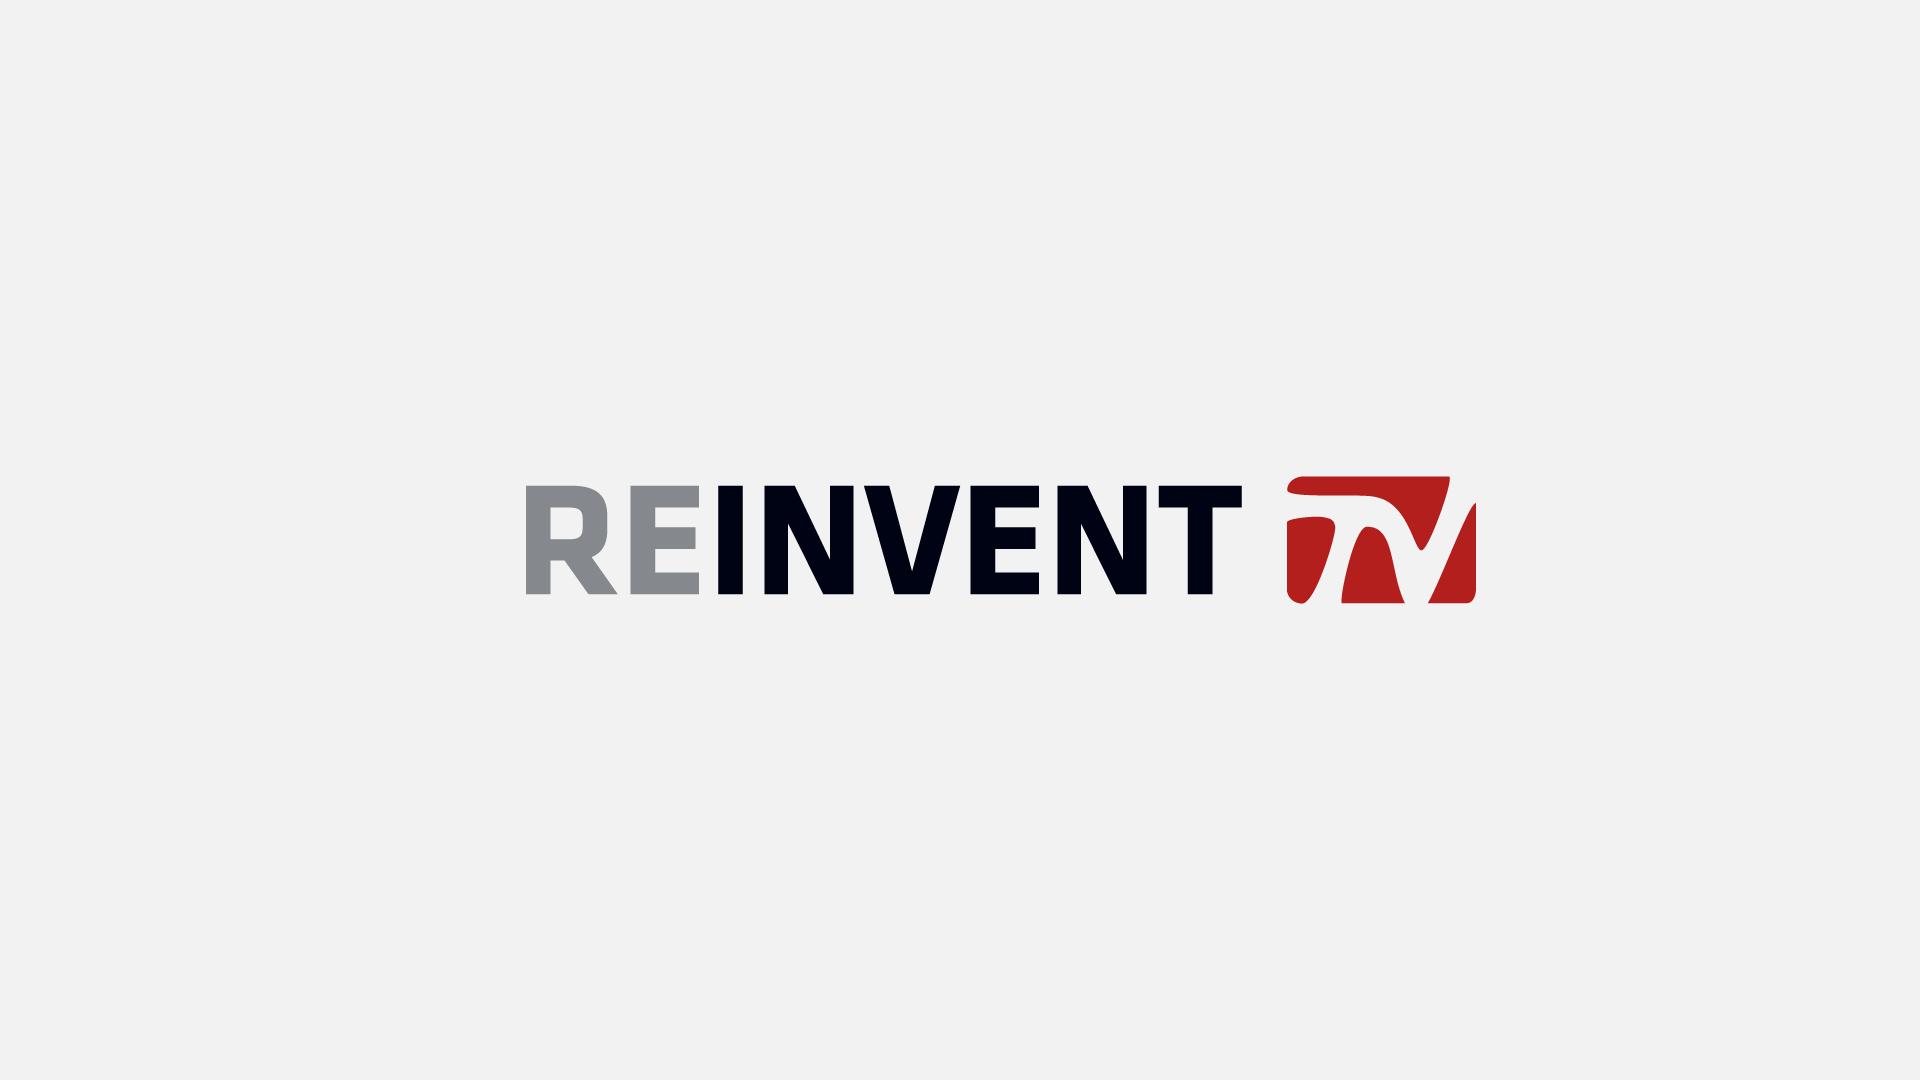 reinvent-logo-01